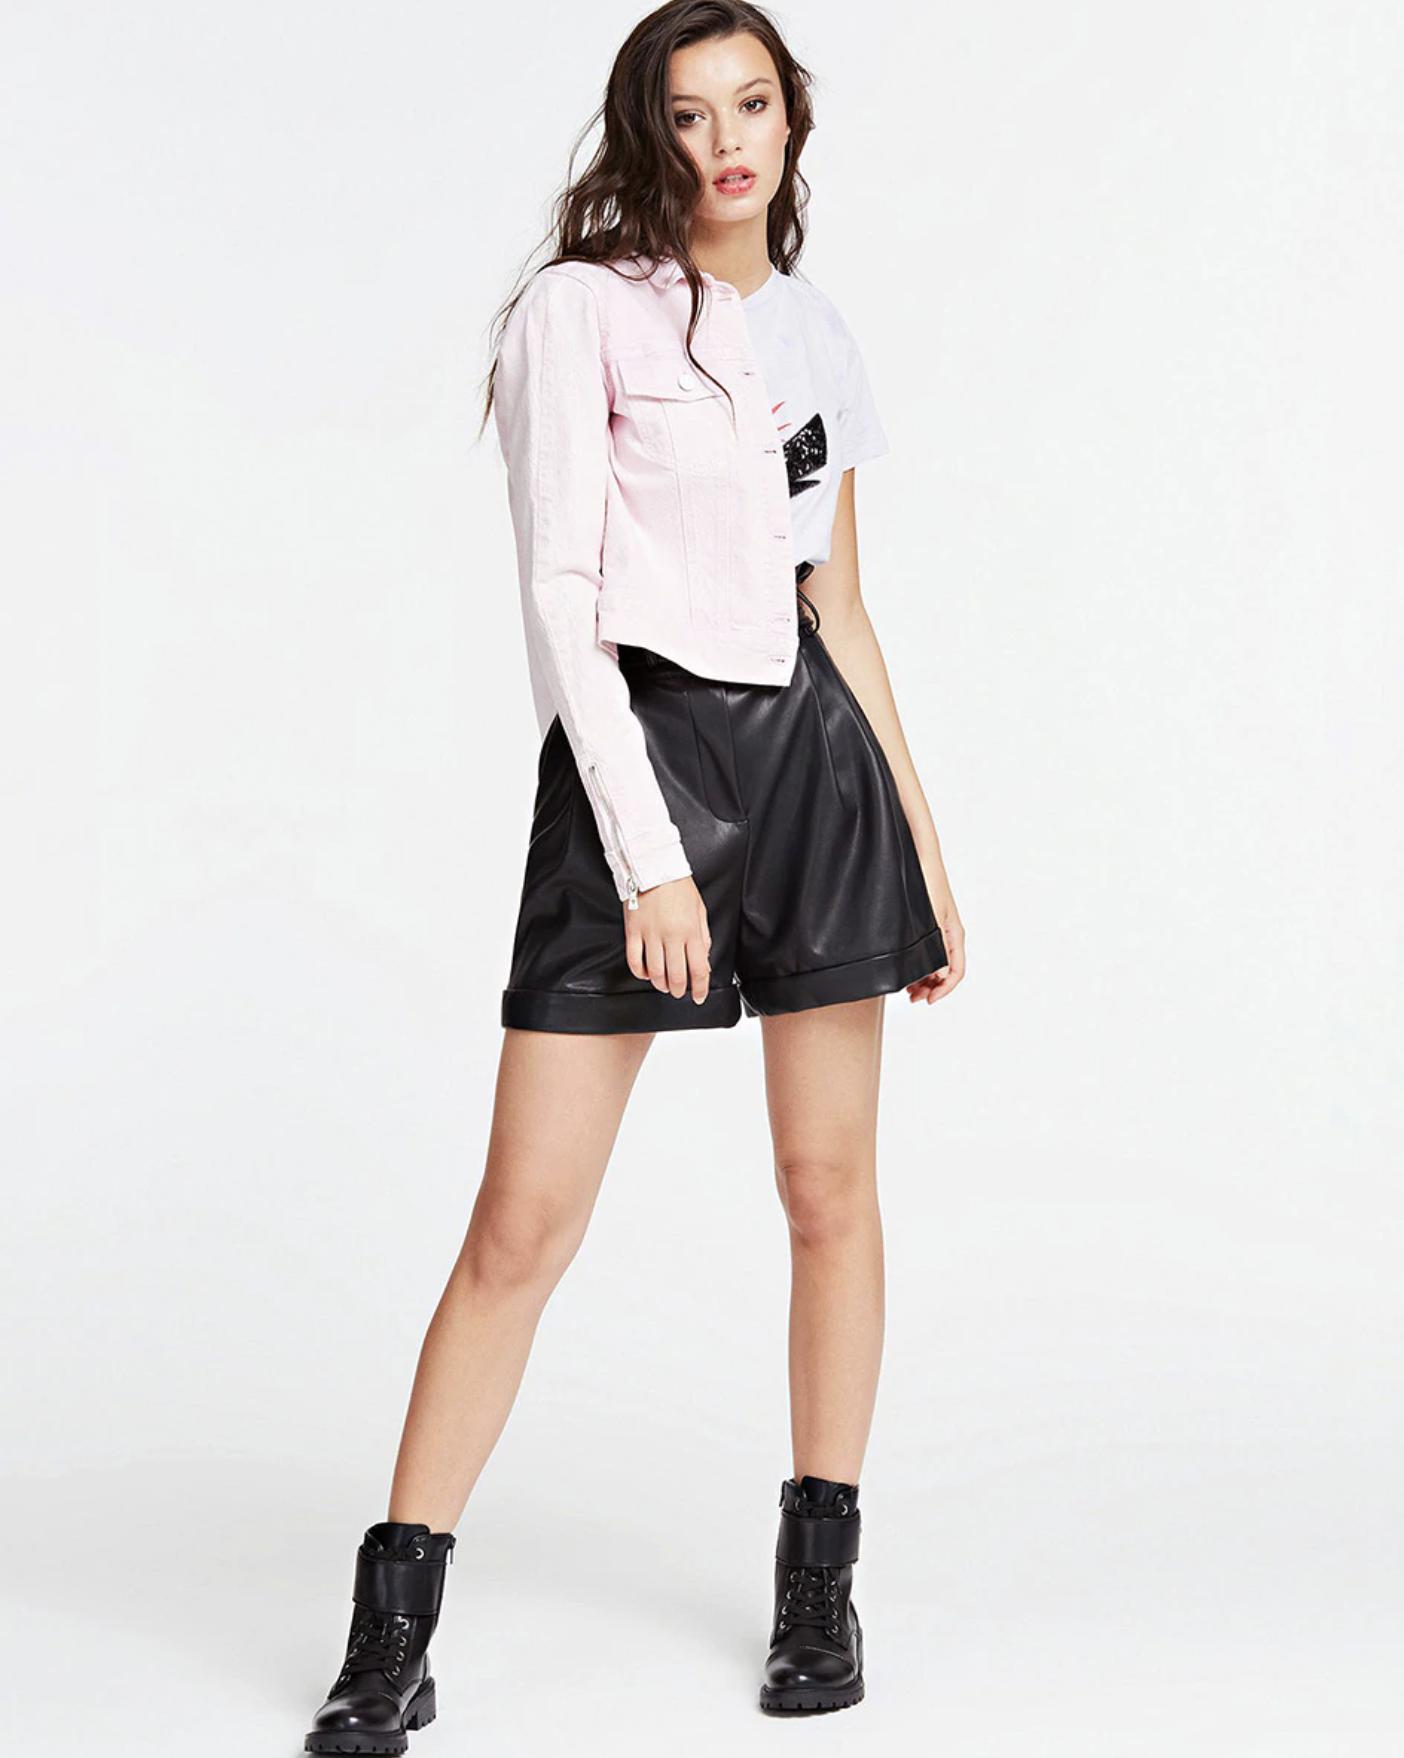 Women's eco leather high shot shorts